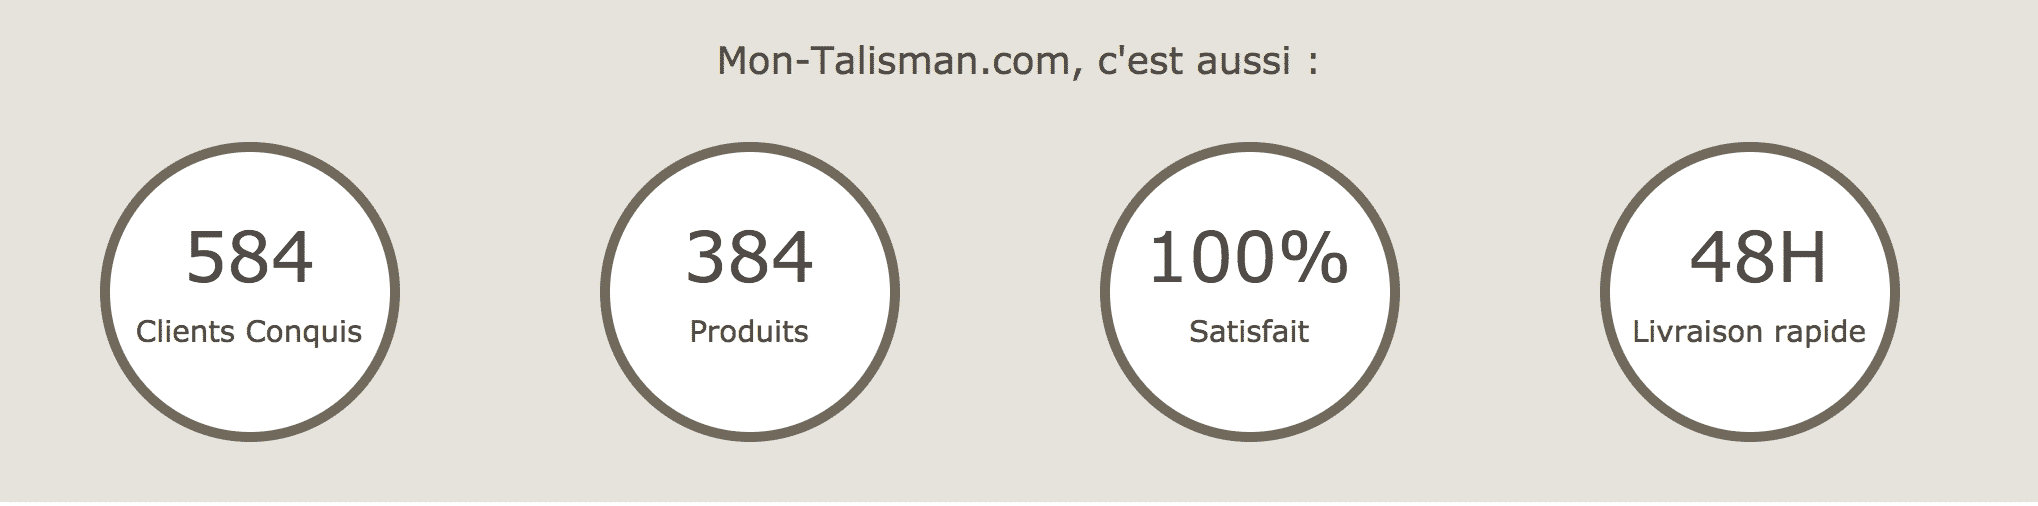 Chiffres clés Mon-Talisman.com